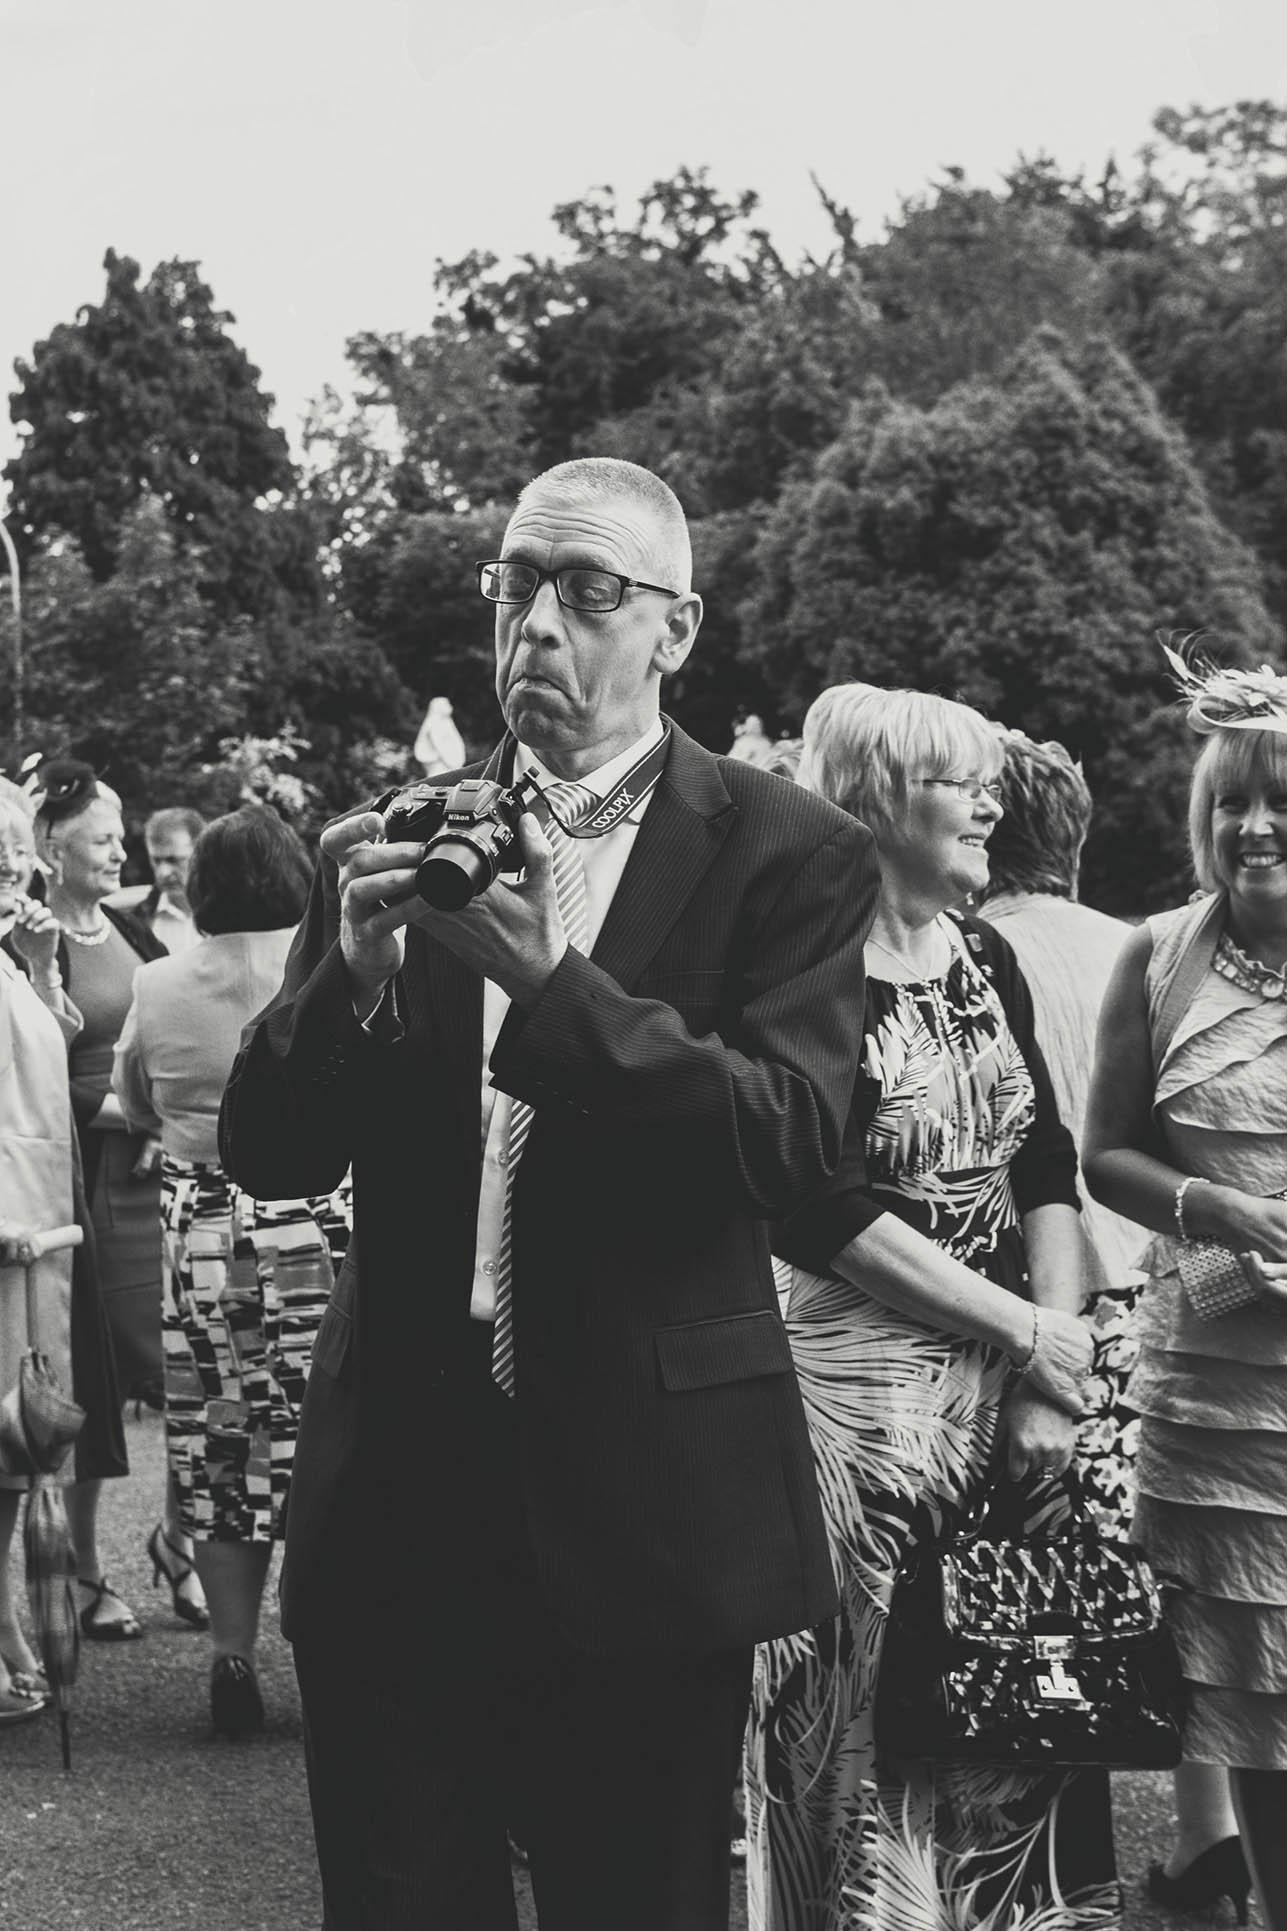 Druids Glen wedding photography, wedding guest taking a photo